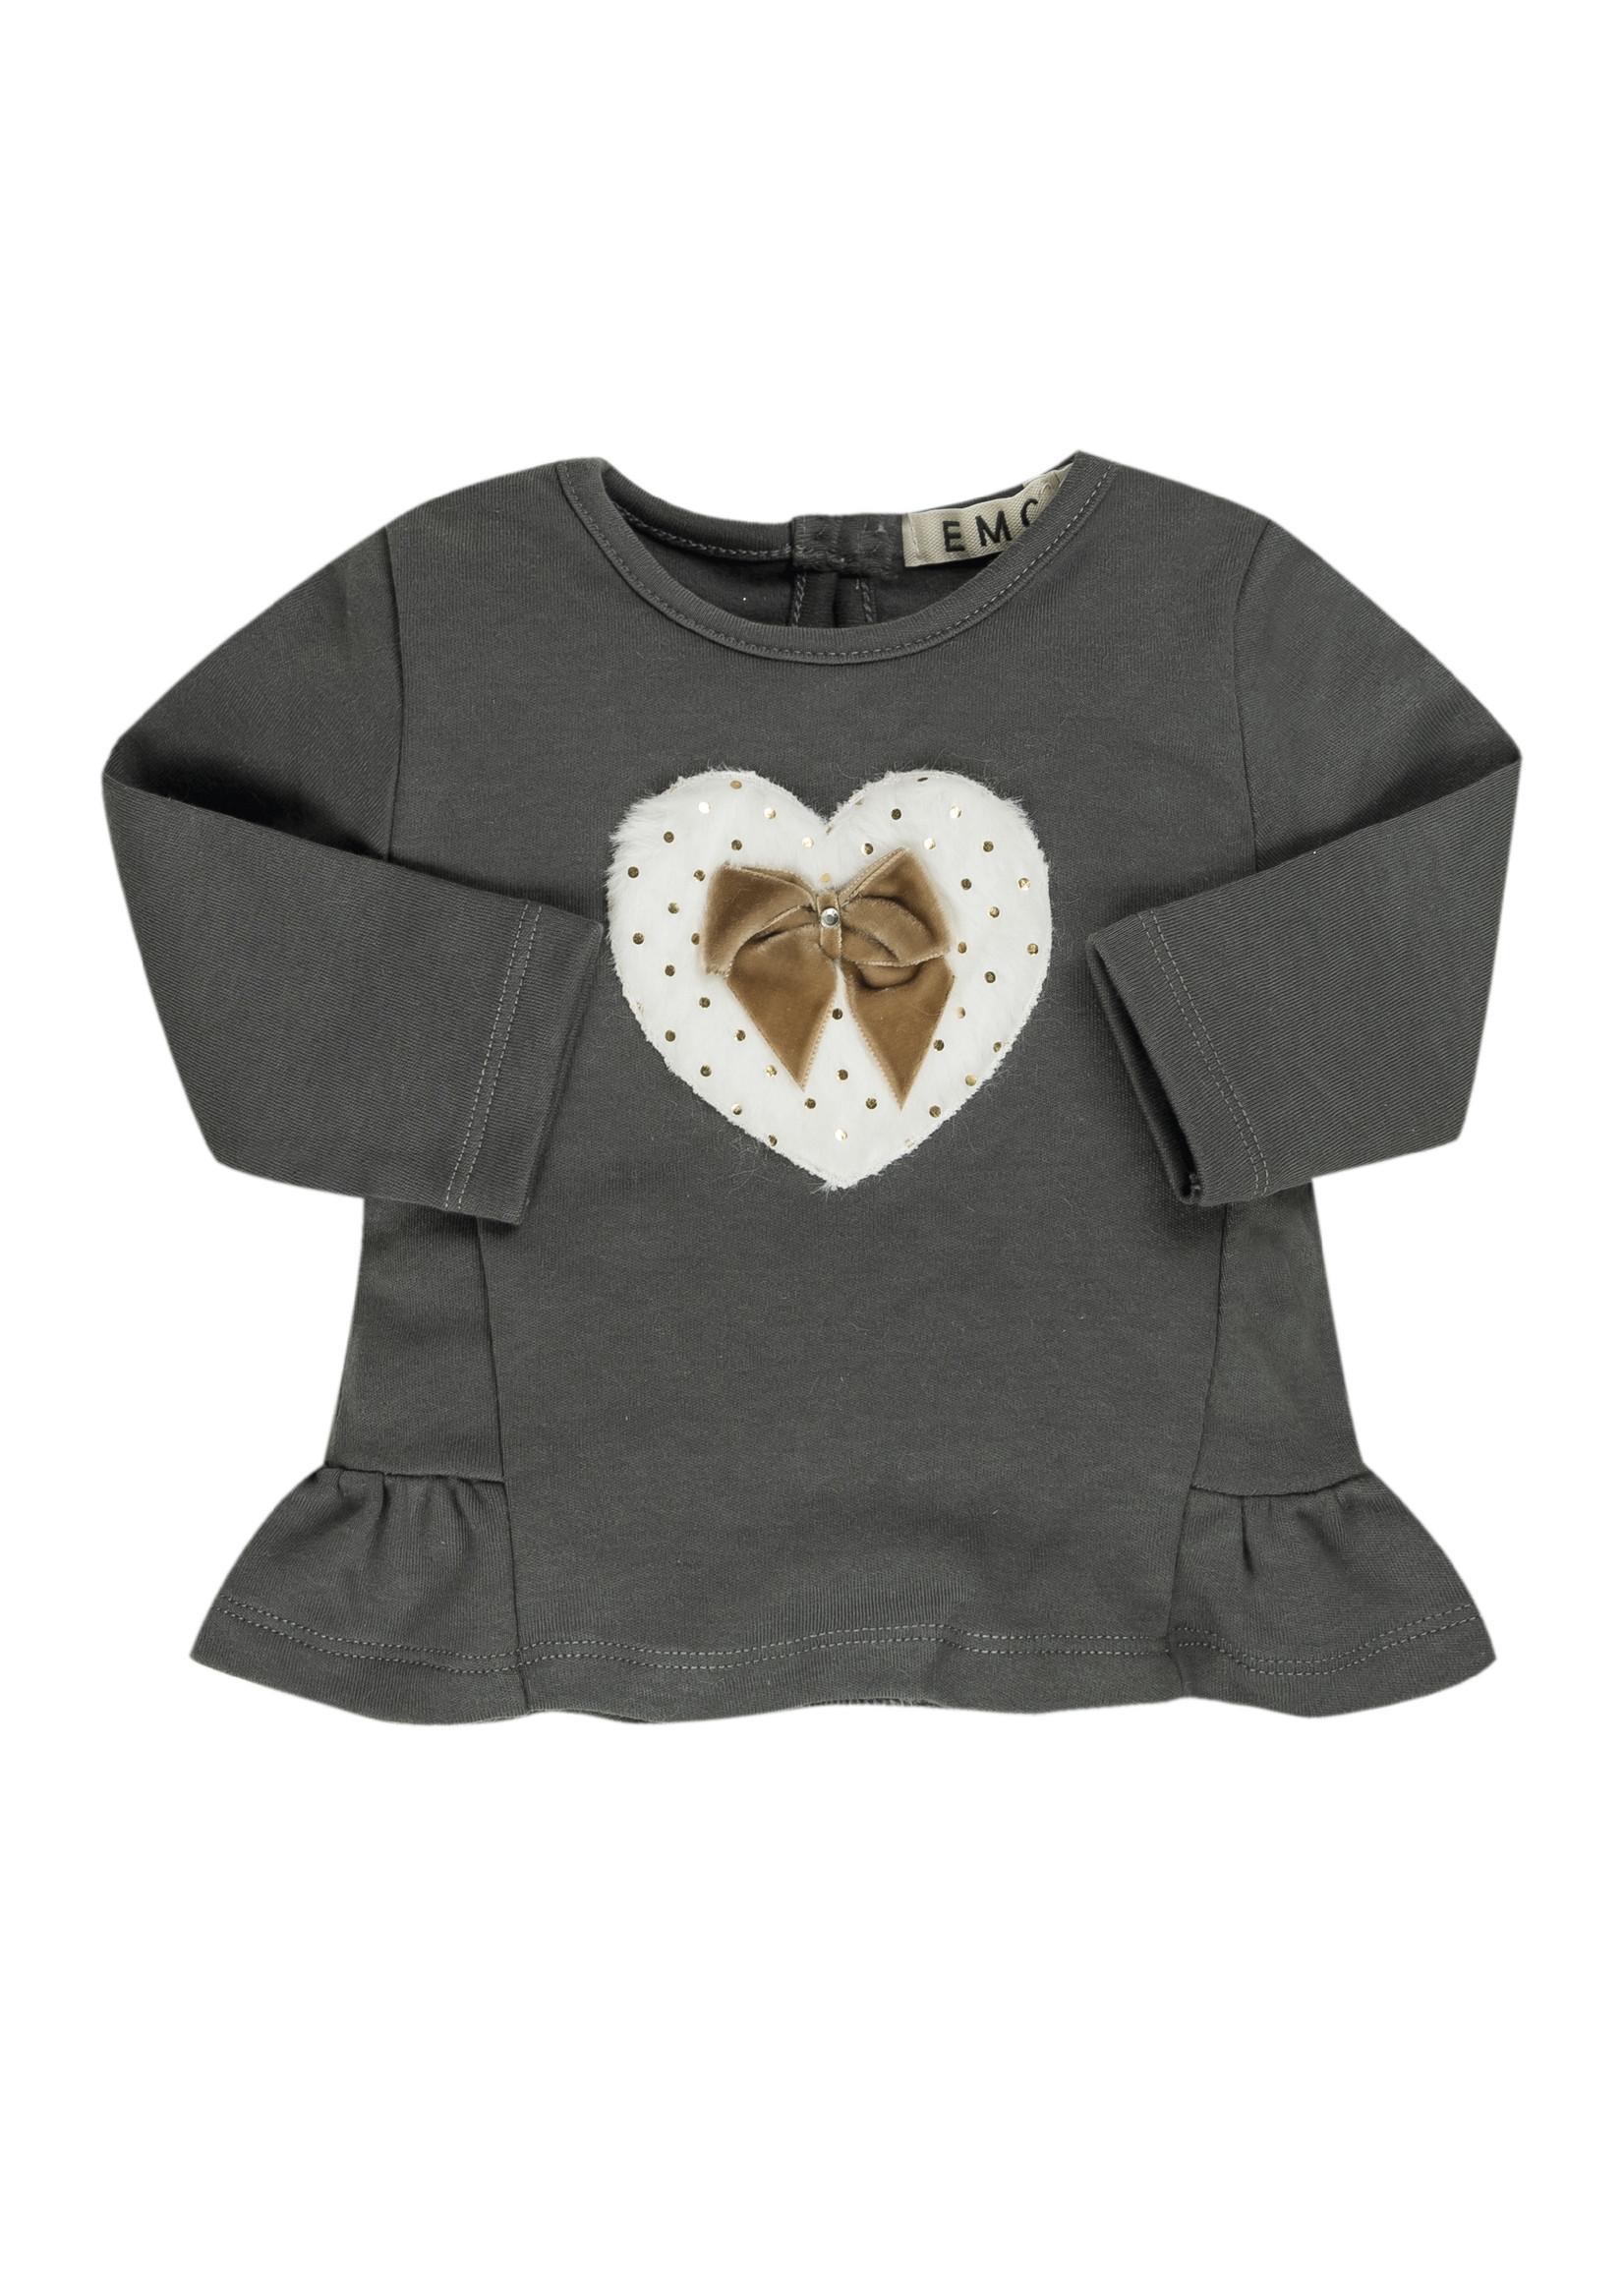 EMC EMC heart brown bow shirt